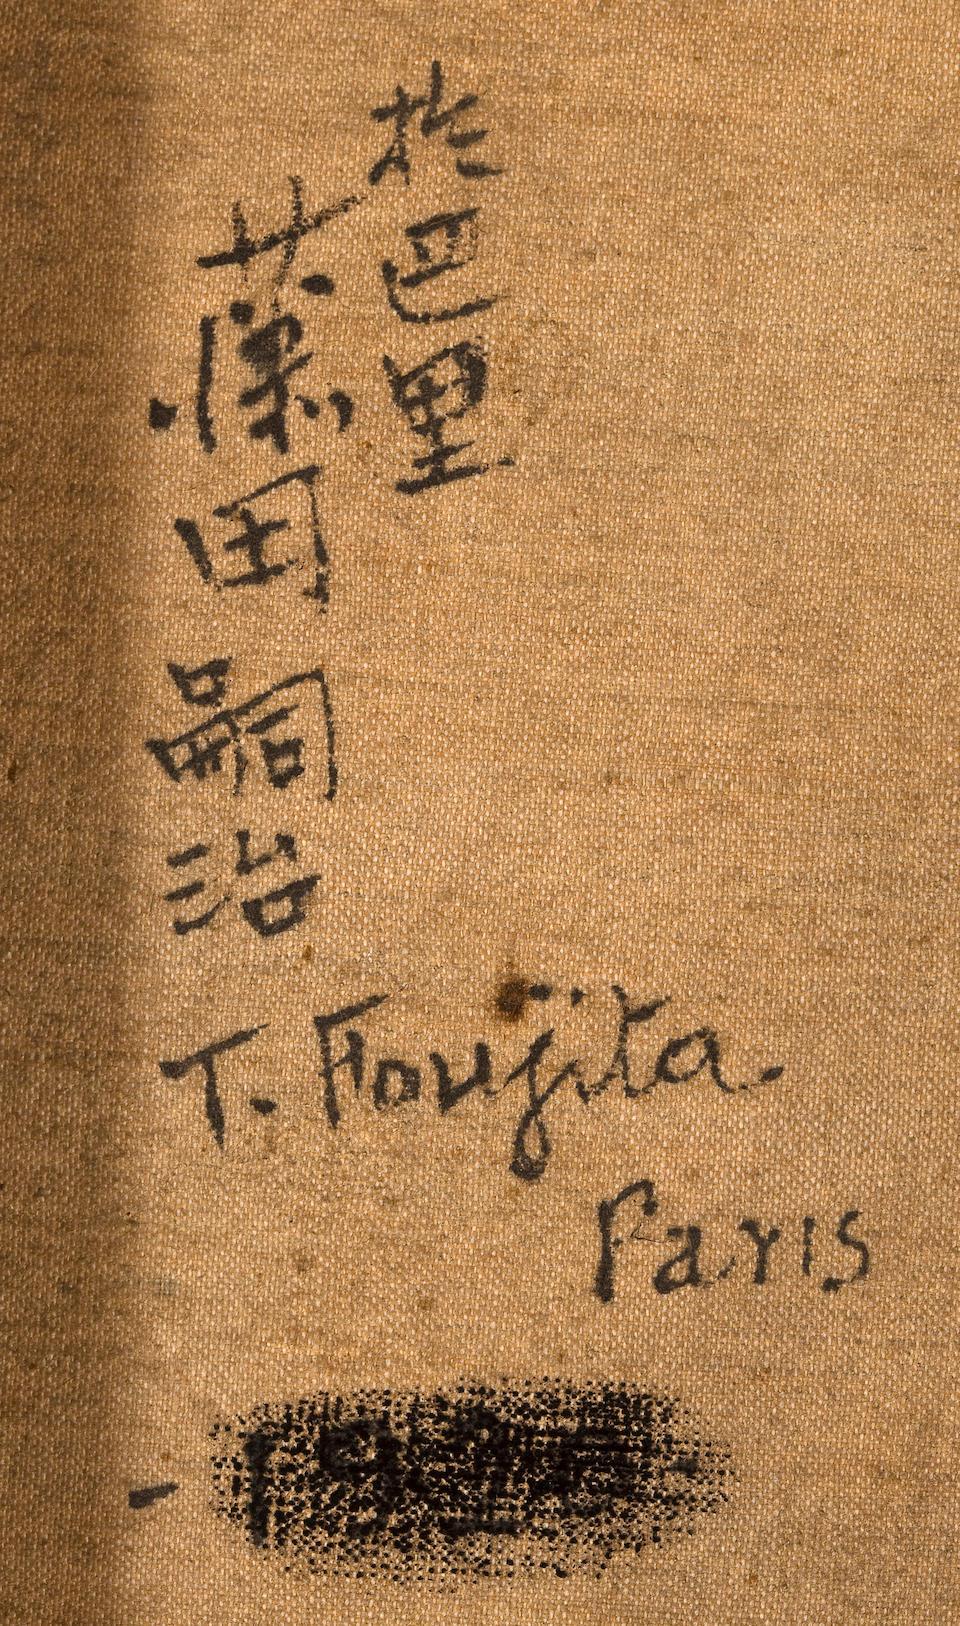 LEONARD TSUGUHARU FOUJITA (1886-1968) Portrait of a young man